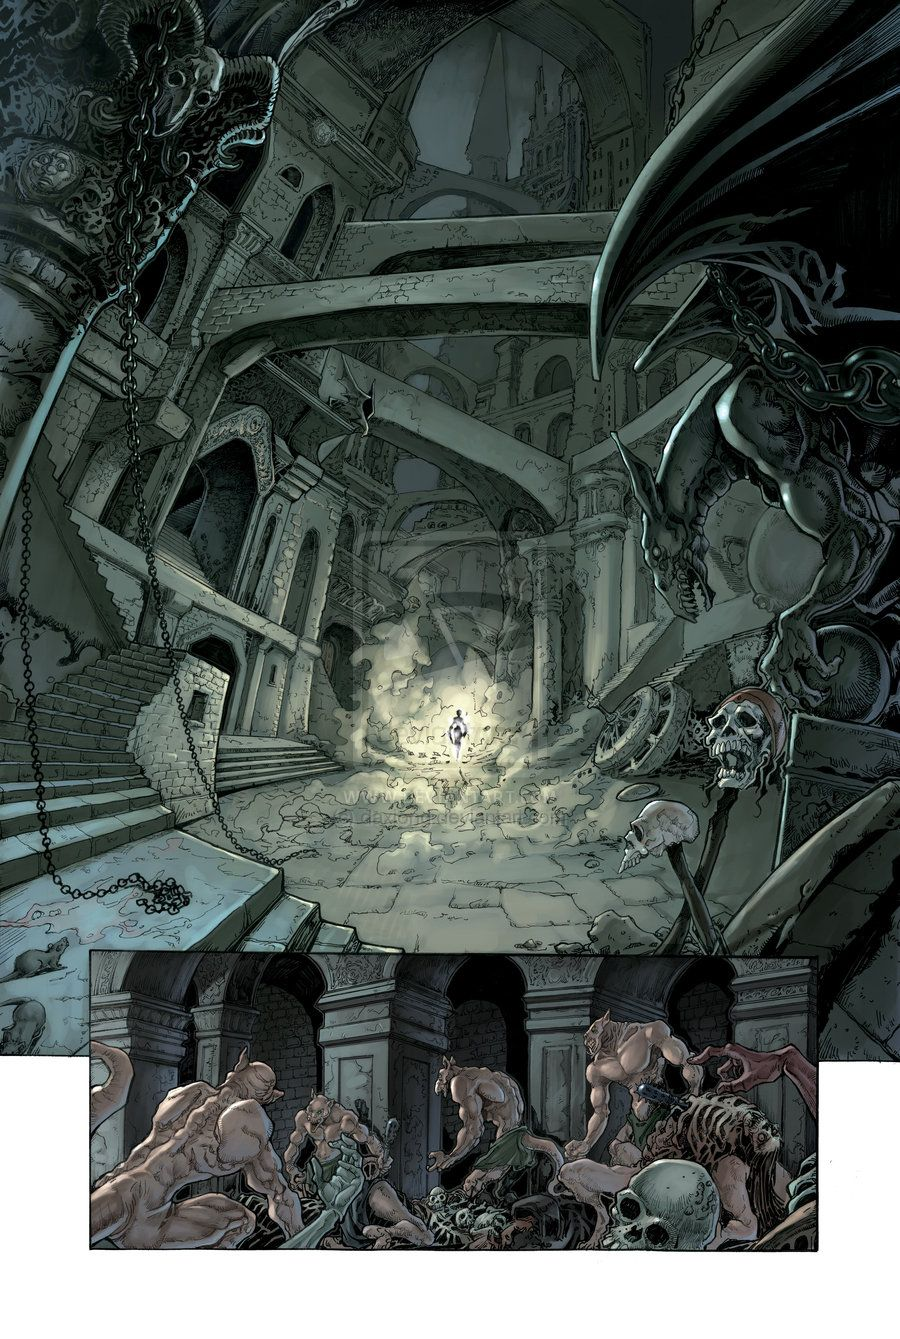 Diablo mini story - 2 by daxiong.deviantart.com on @deviantART